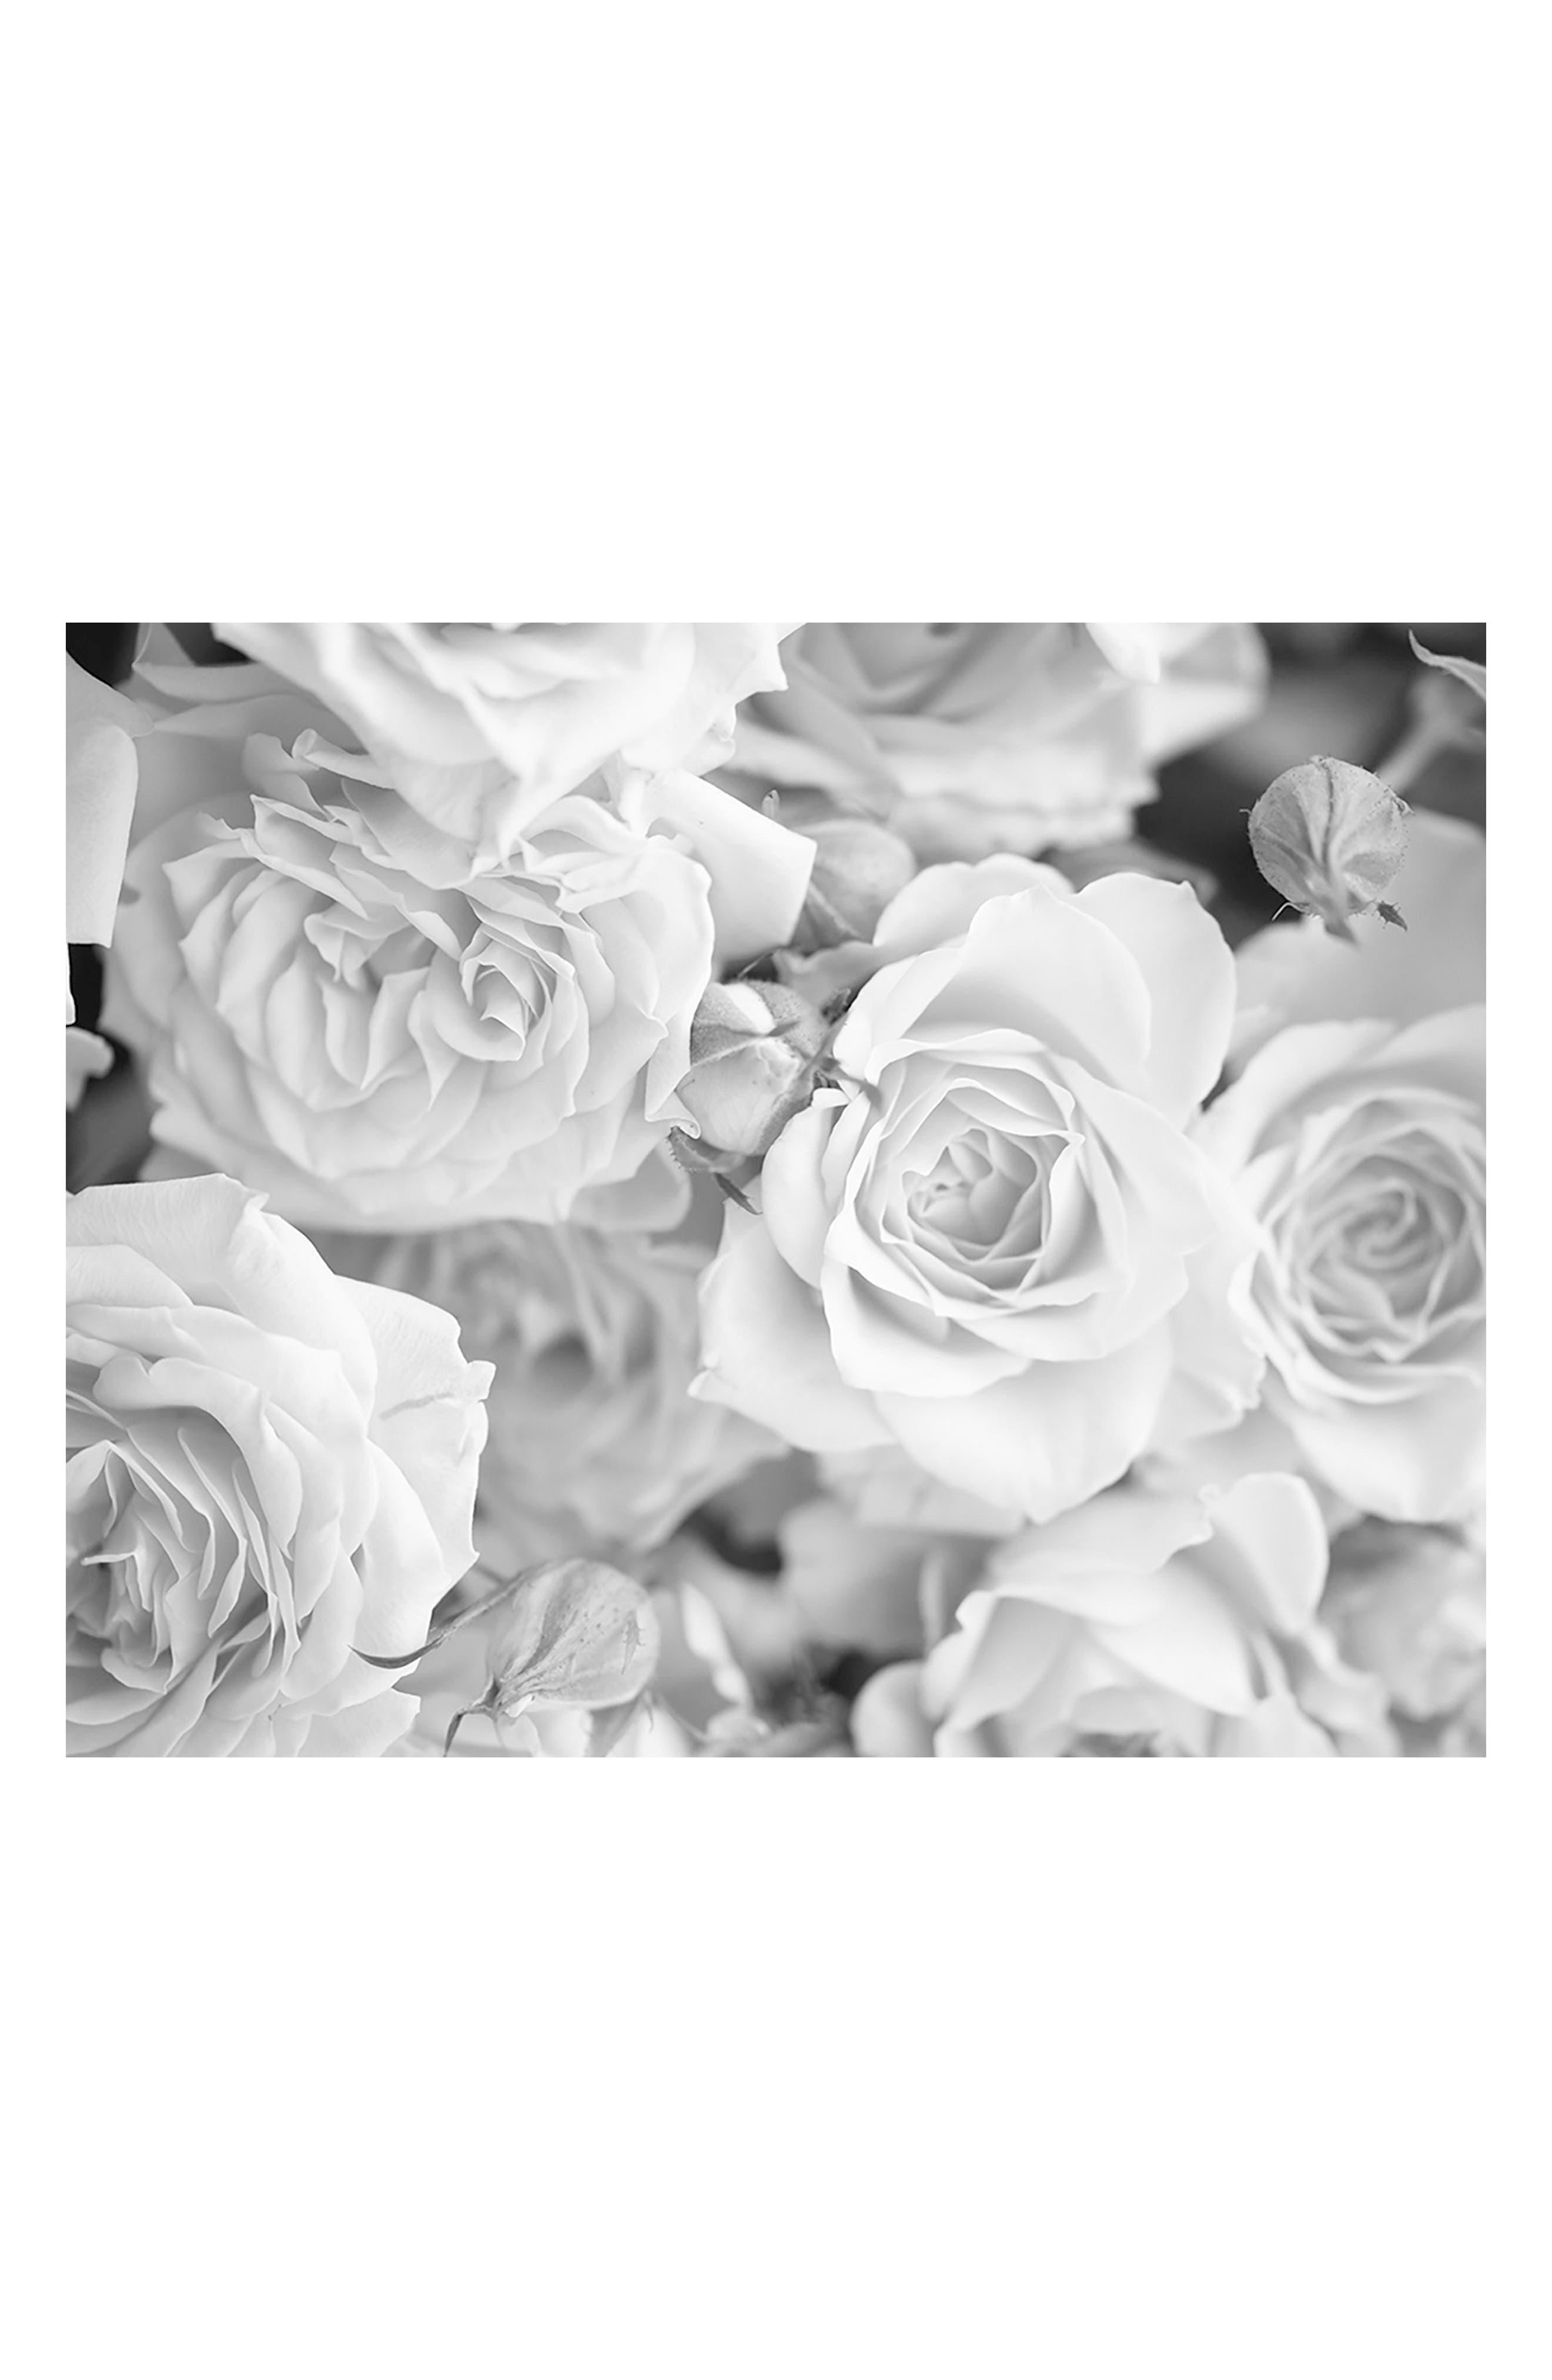 Grey Petals 6-Panel Wall Mural,                             Main thumbnail 1, color,                             White Off-White